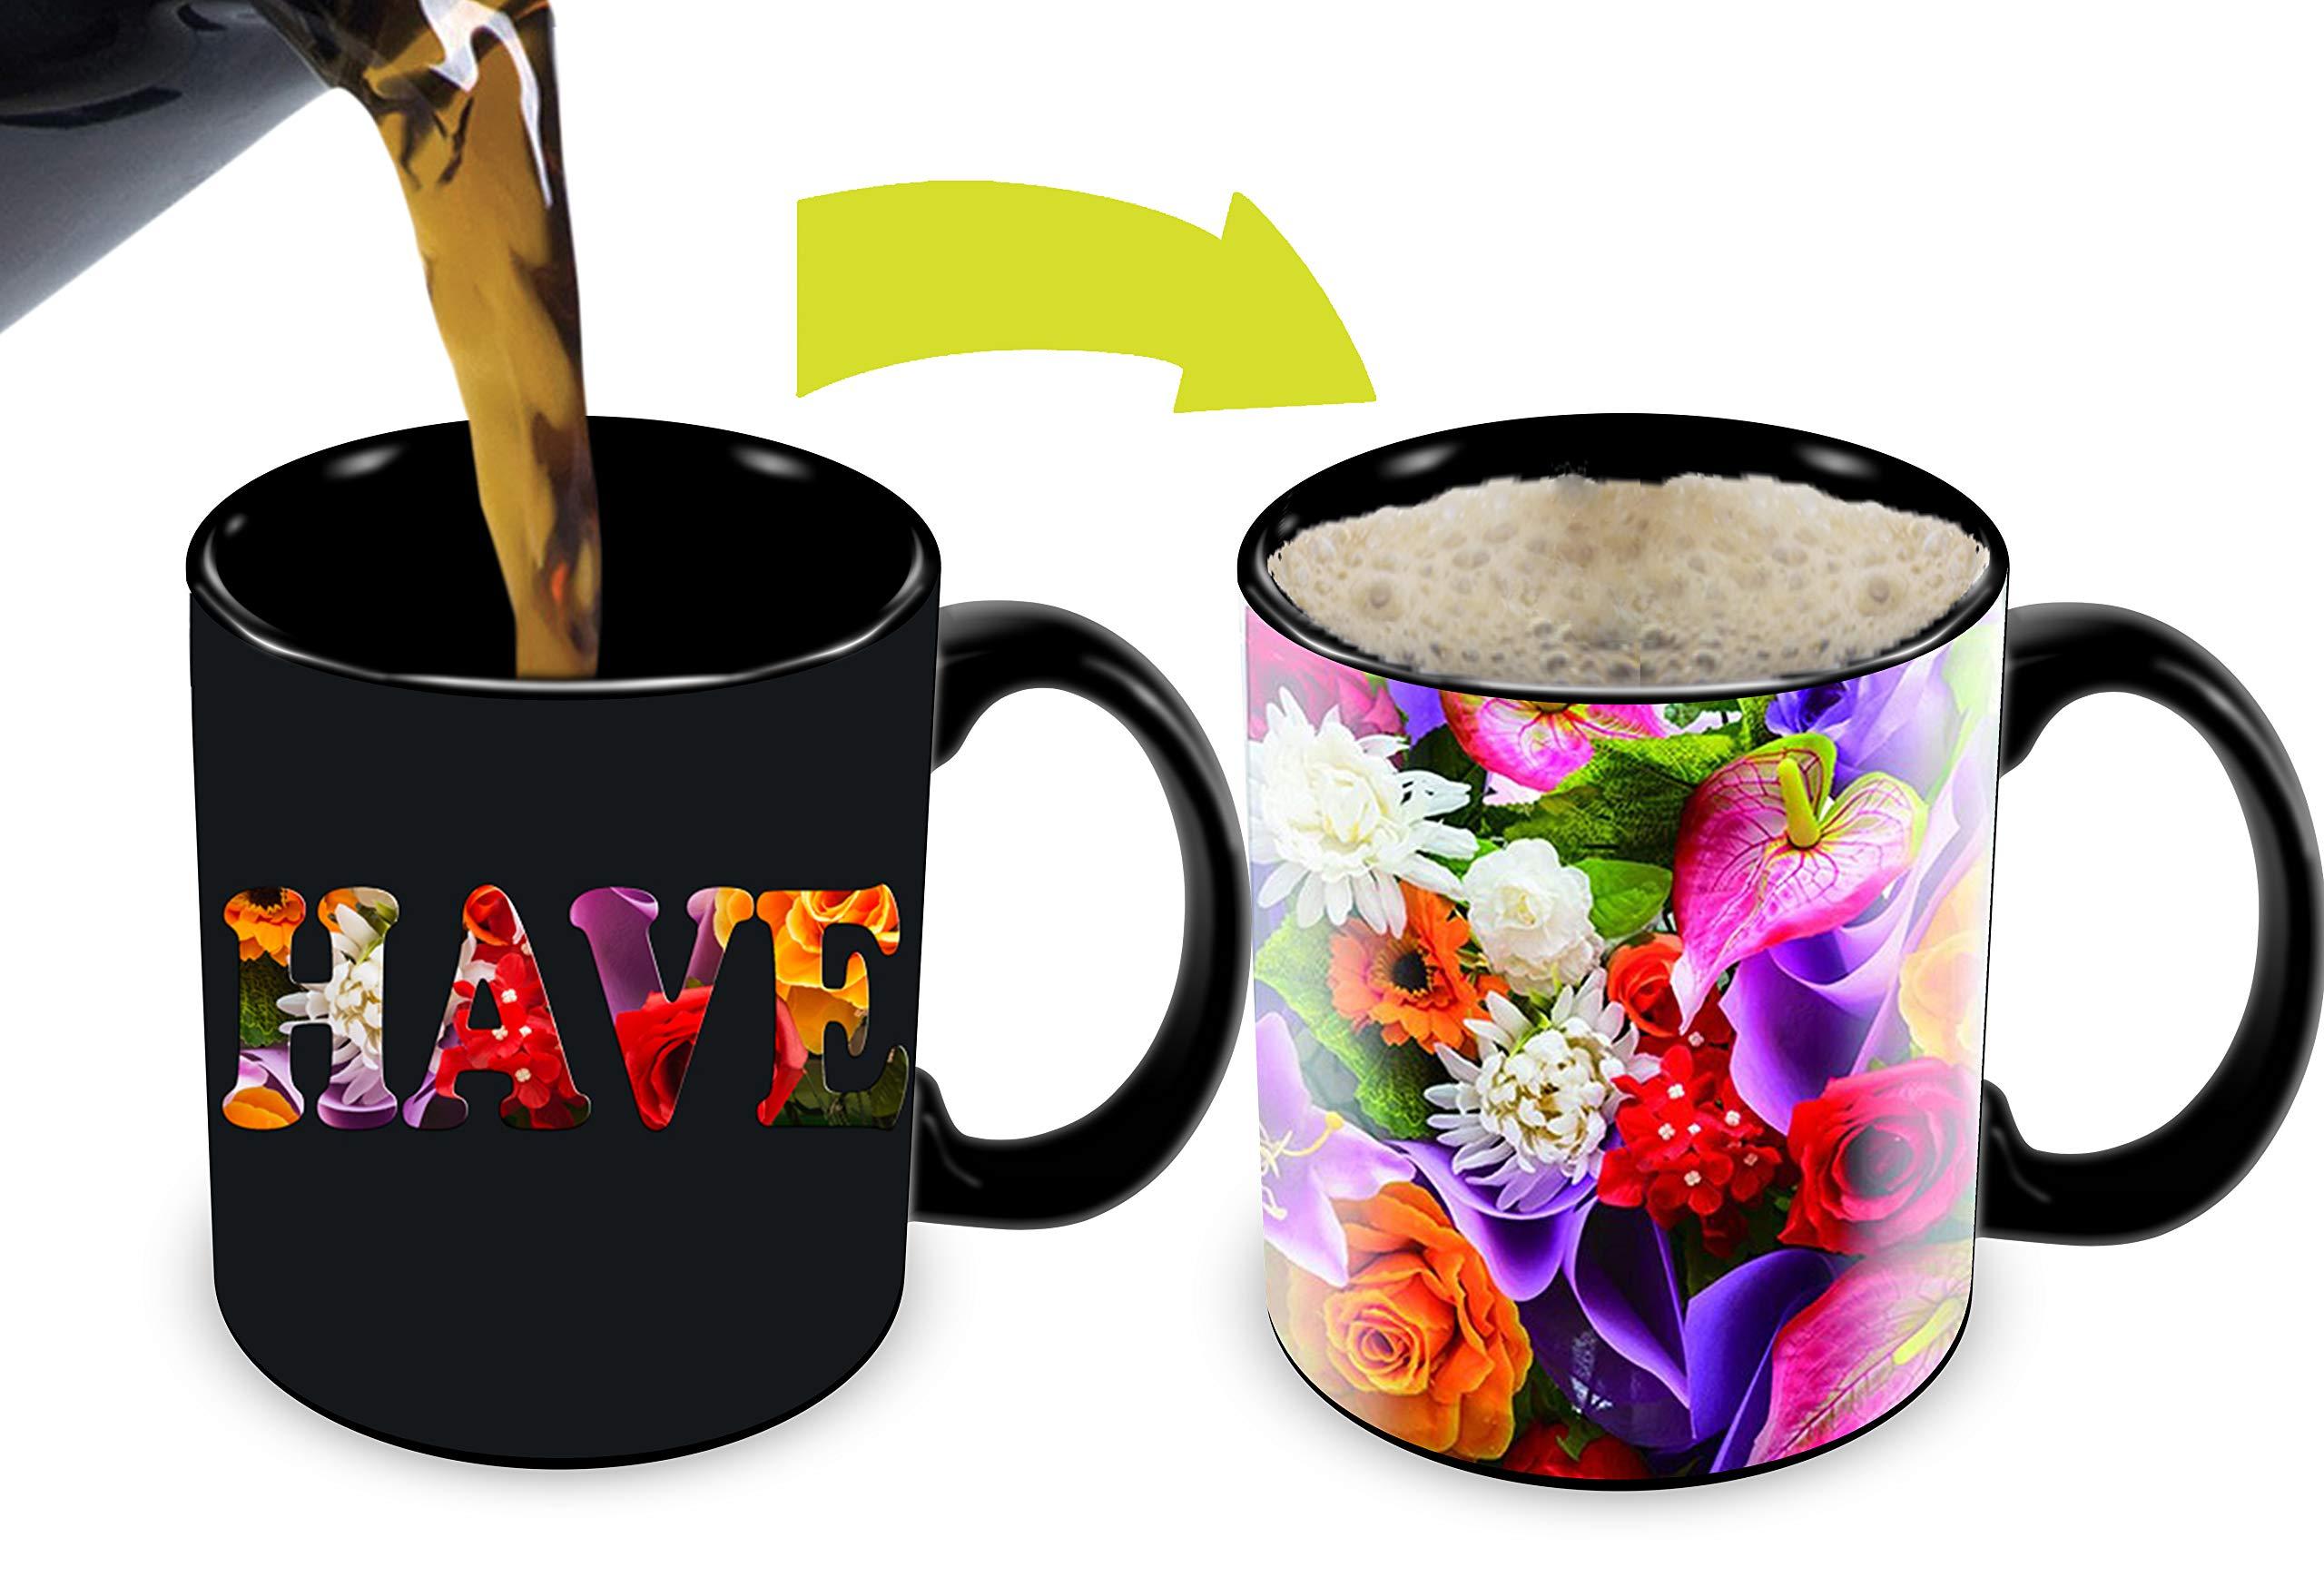 Heat Sensitive Mug | Color Changing Coffee Mug | Funny Coffee Cup | Have A Nice Day Flowers Design 11oz 100% Ceramic Black Mug